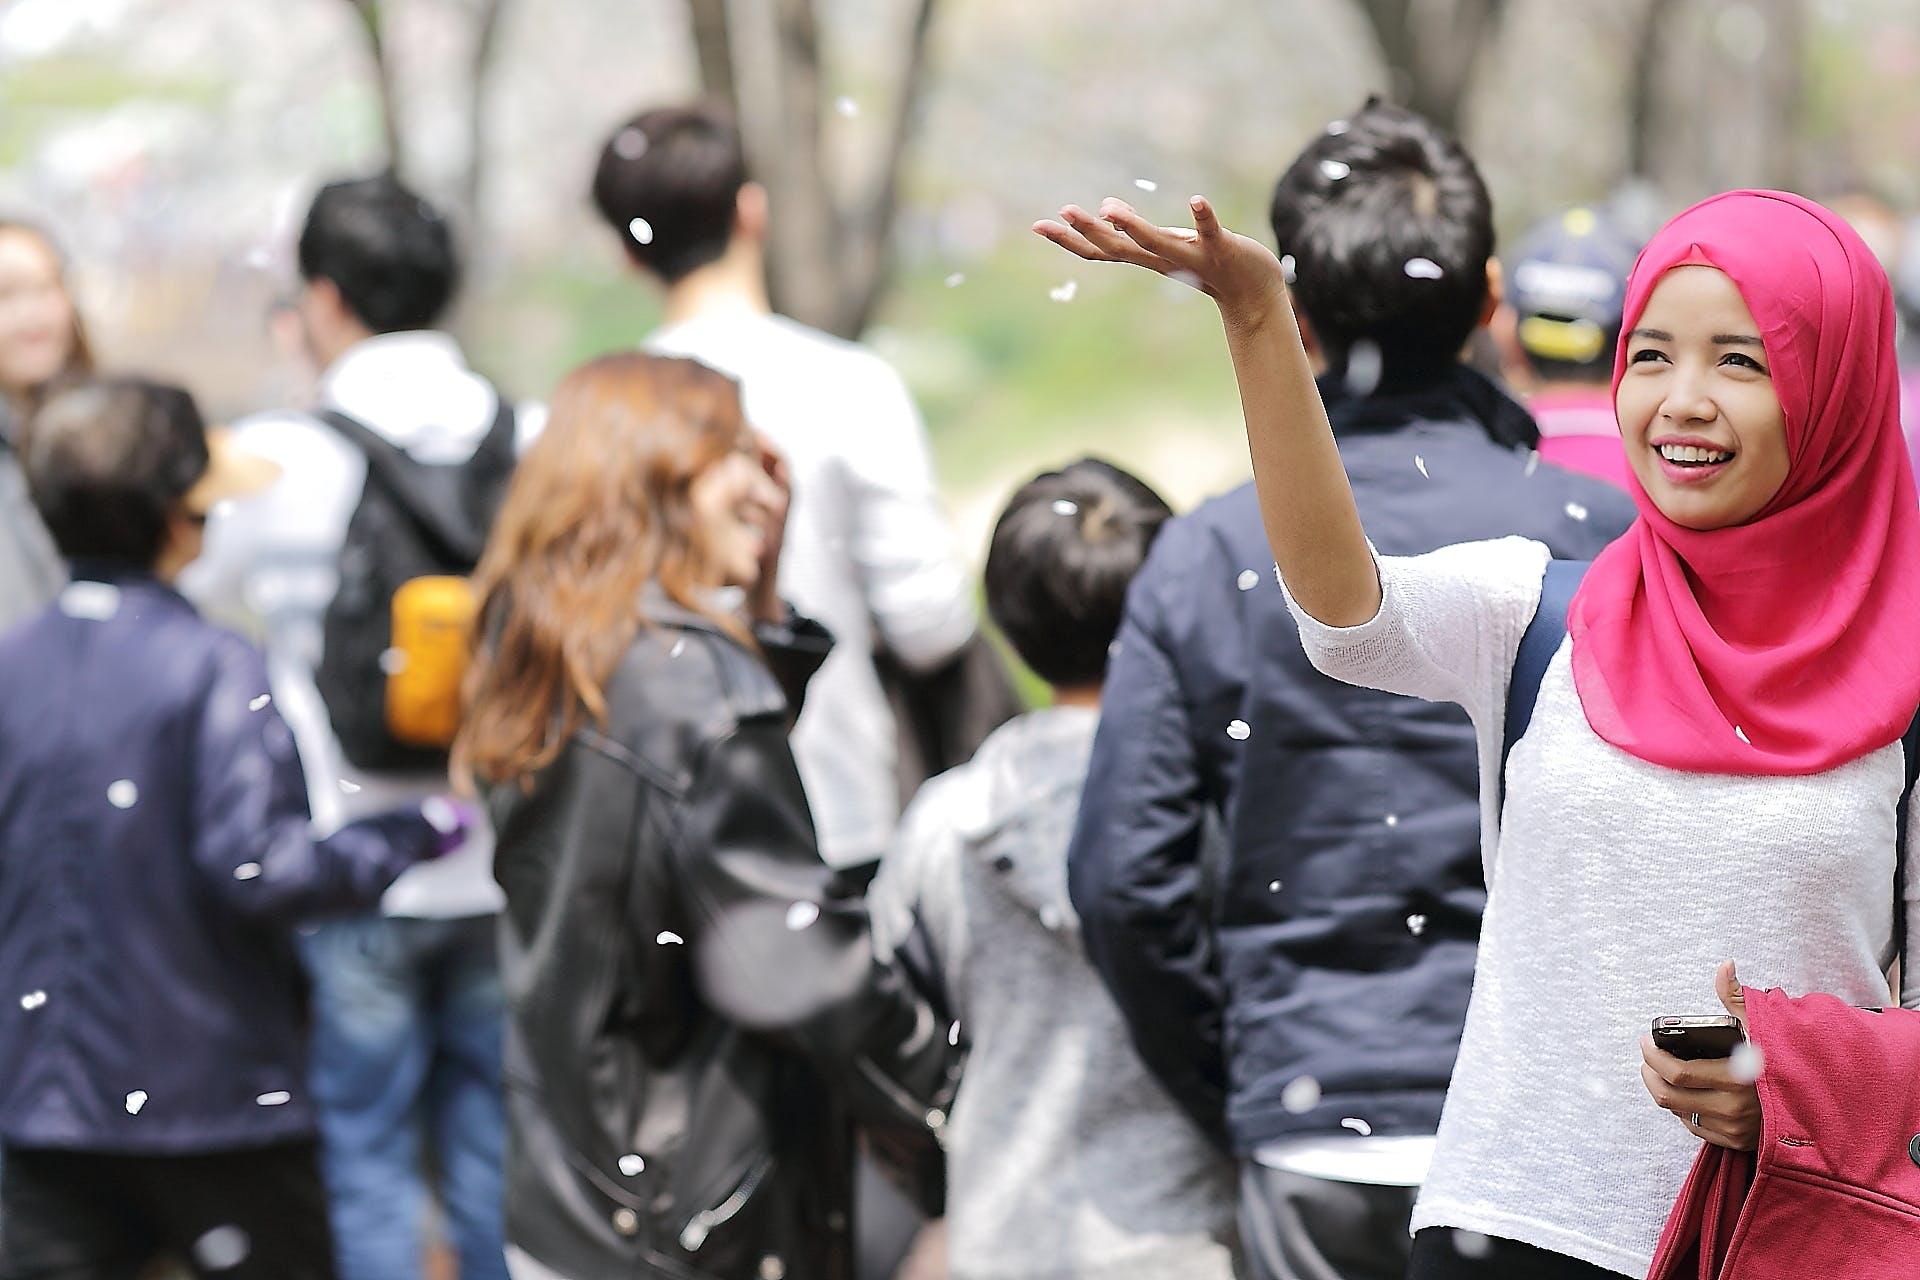 Woman Wearing Red Hijab Behind Person Wearing Black Jacket